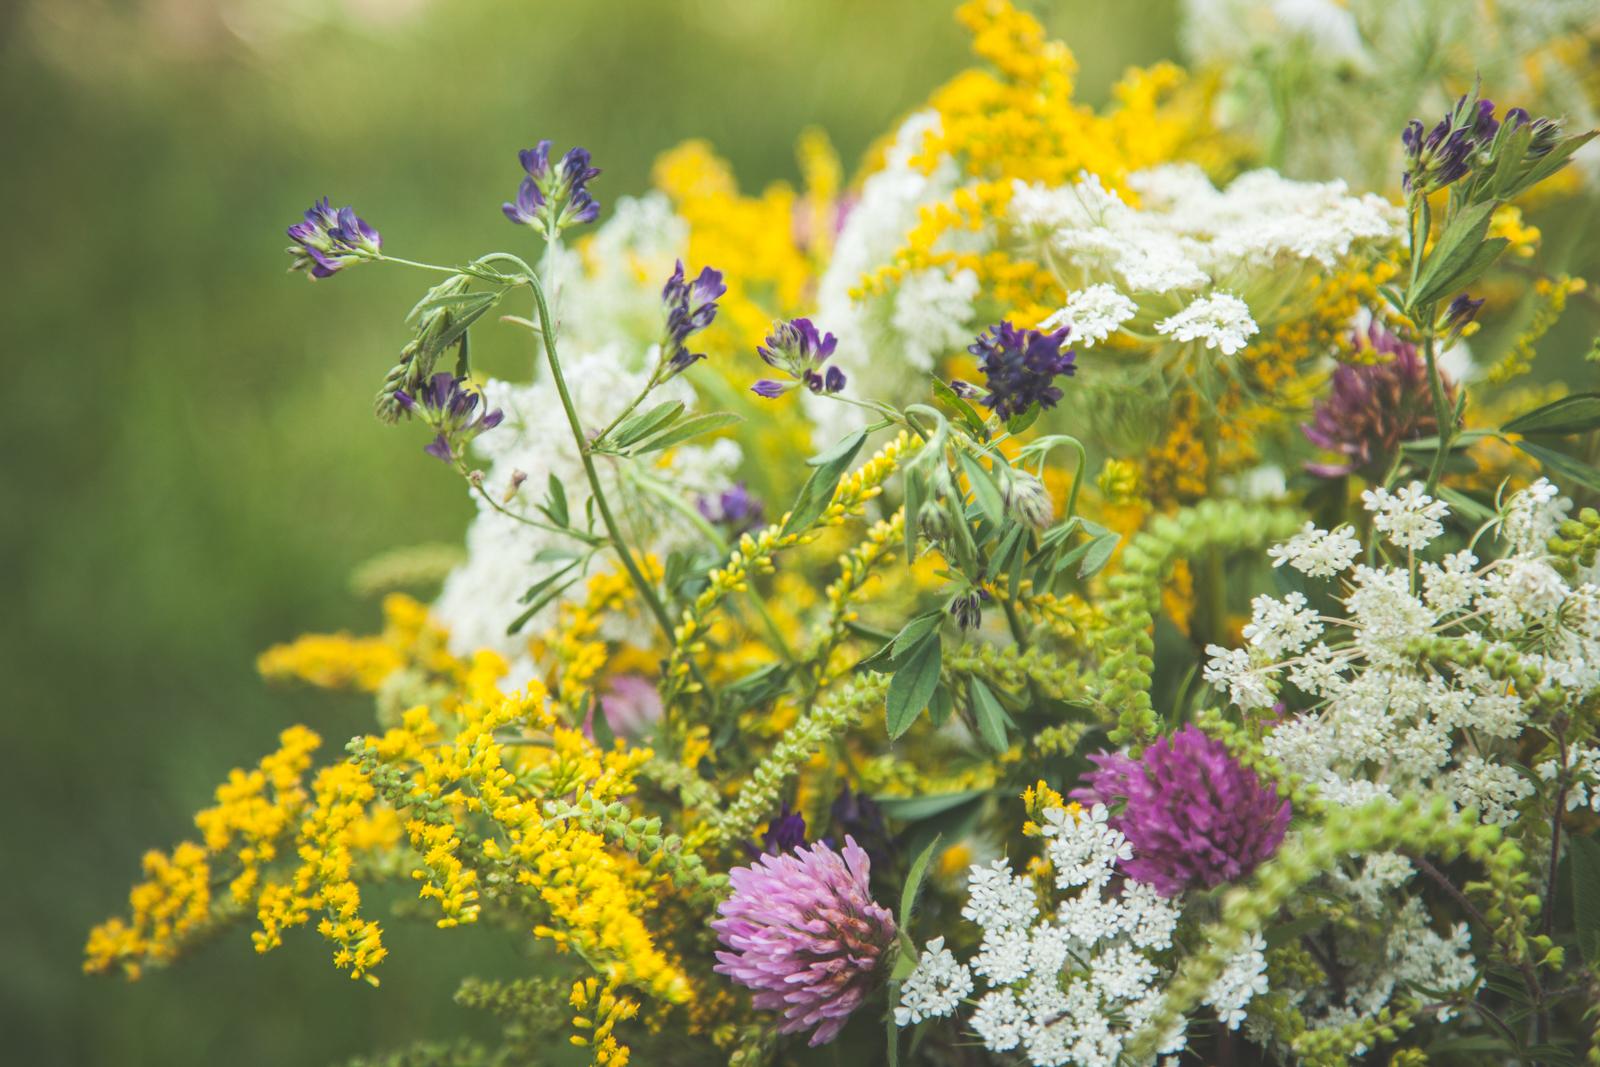 WildflowersPart2-sm-0544.jpg